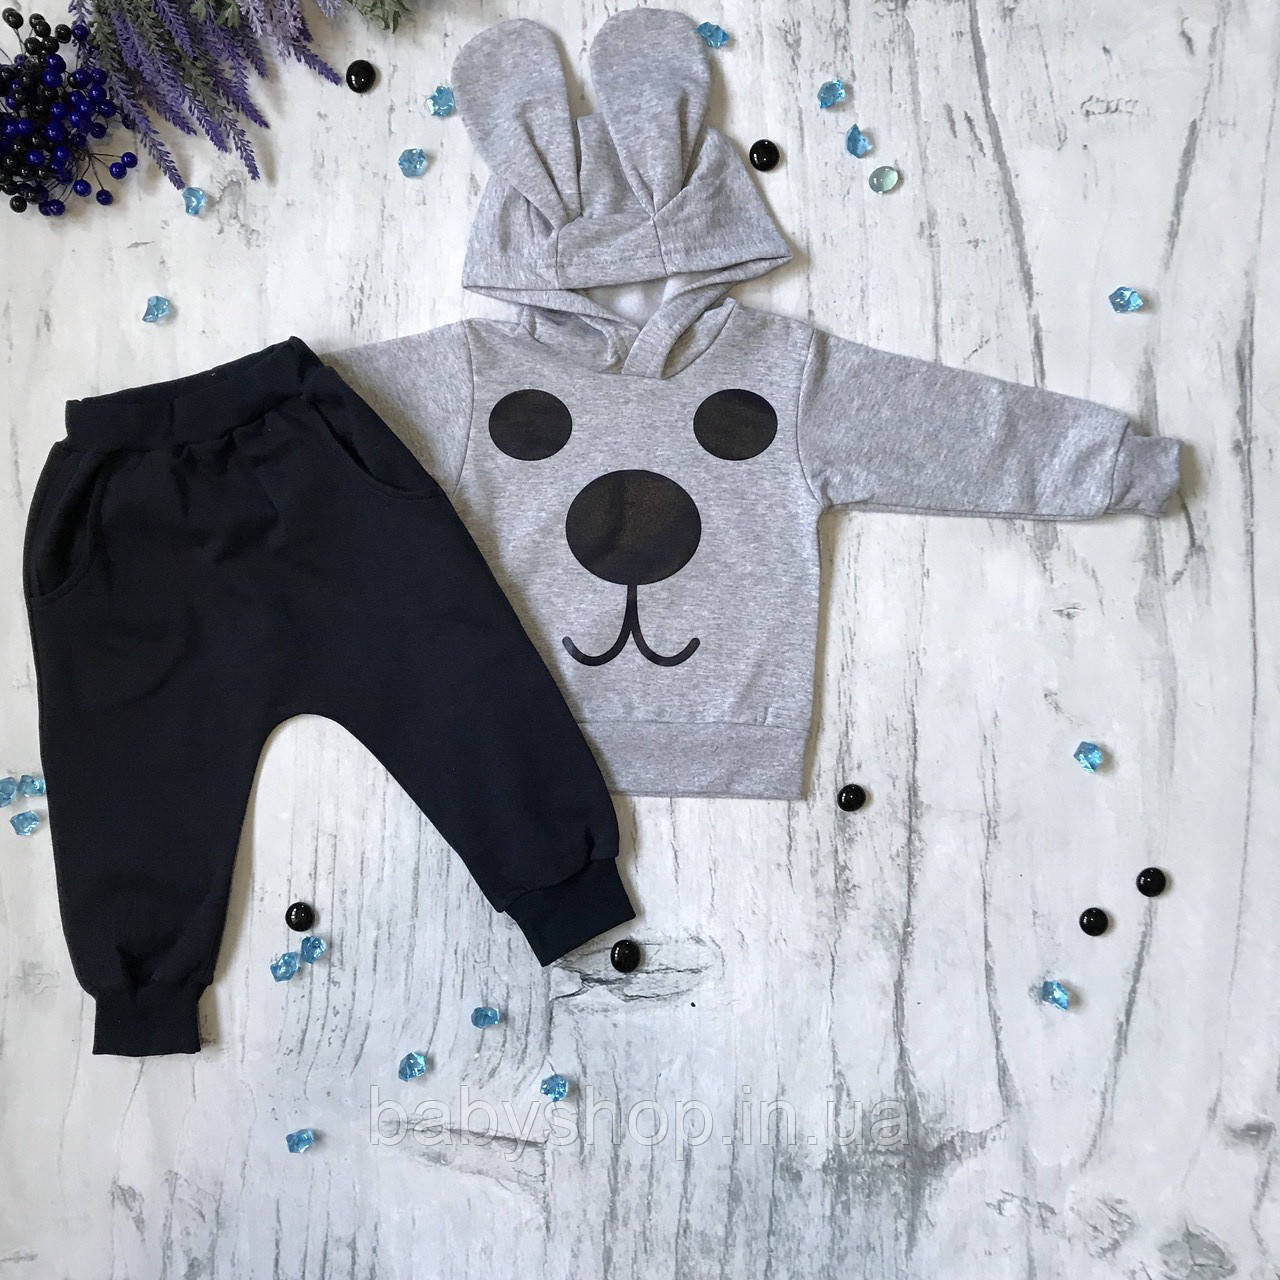 Теплый костюм на мальчика 1/12/б11. Размер 80 см ( 1 год)